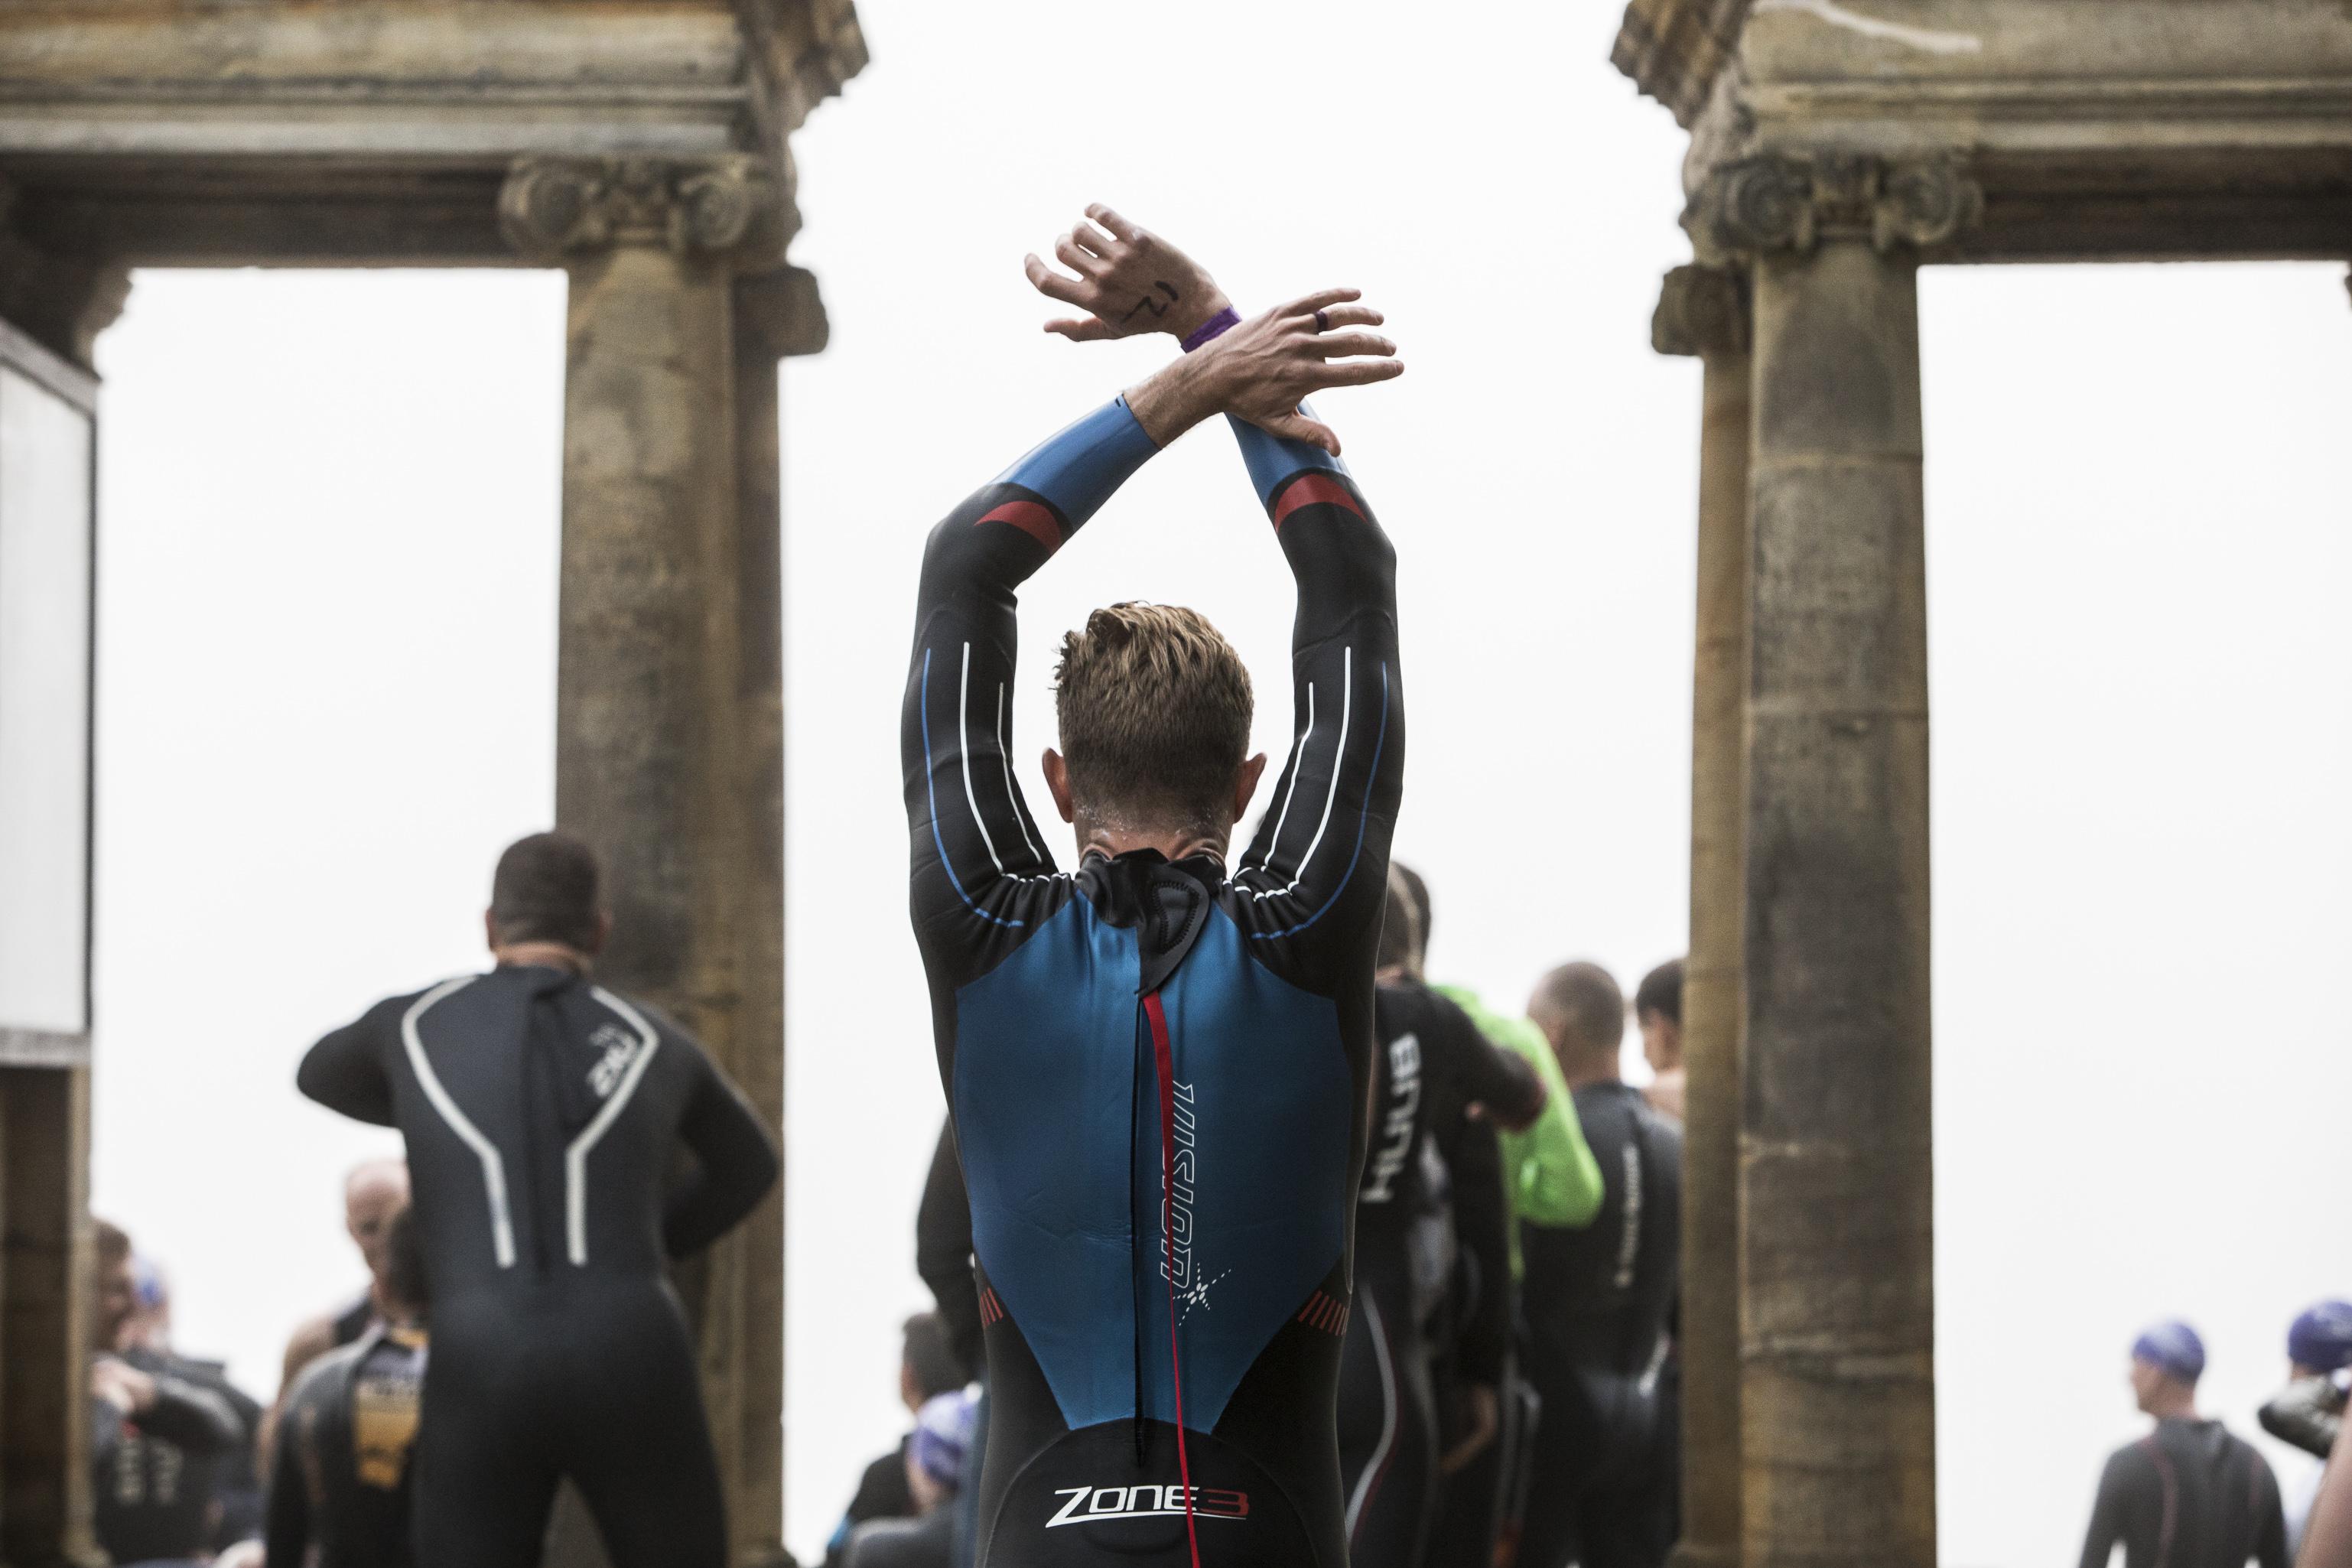 Hever Castle Festival of Endurance Aquathlon \u002D Multisport Series - cover image